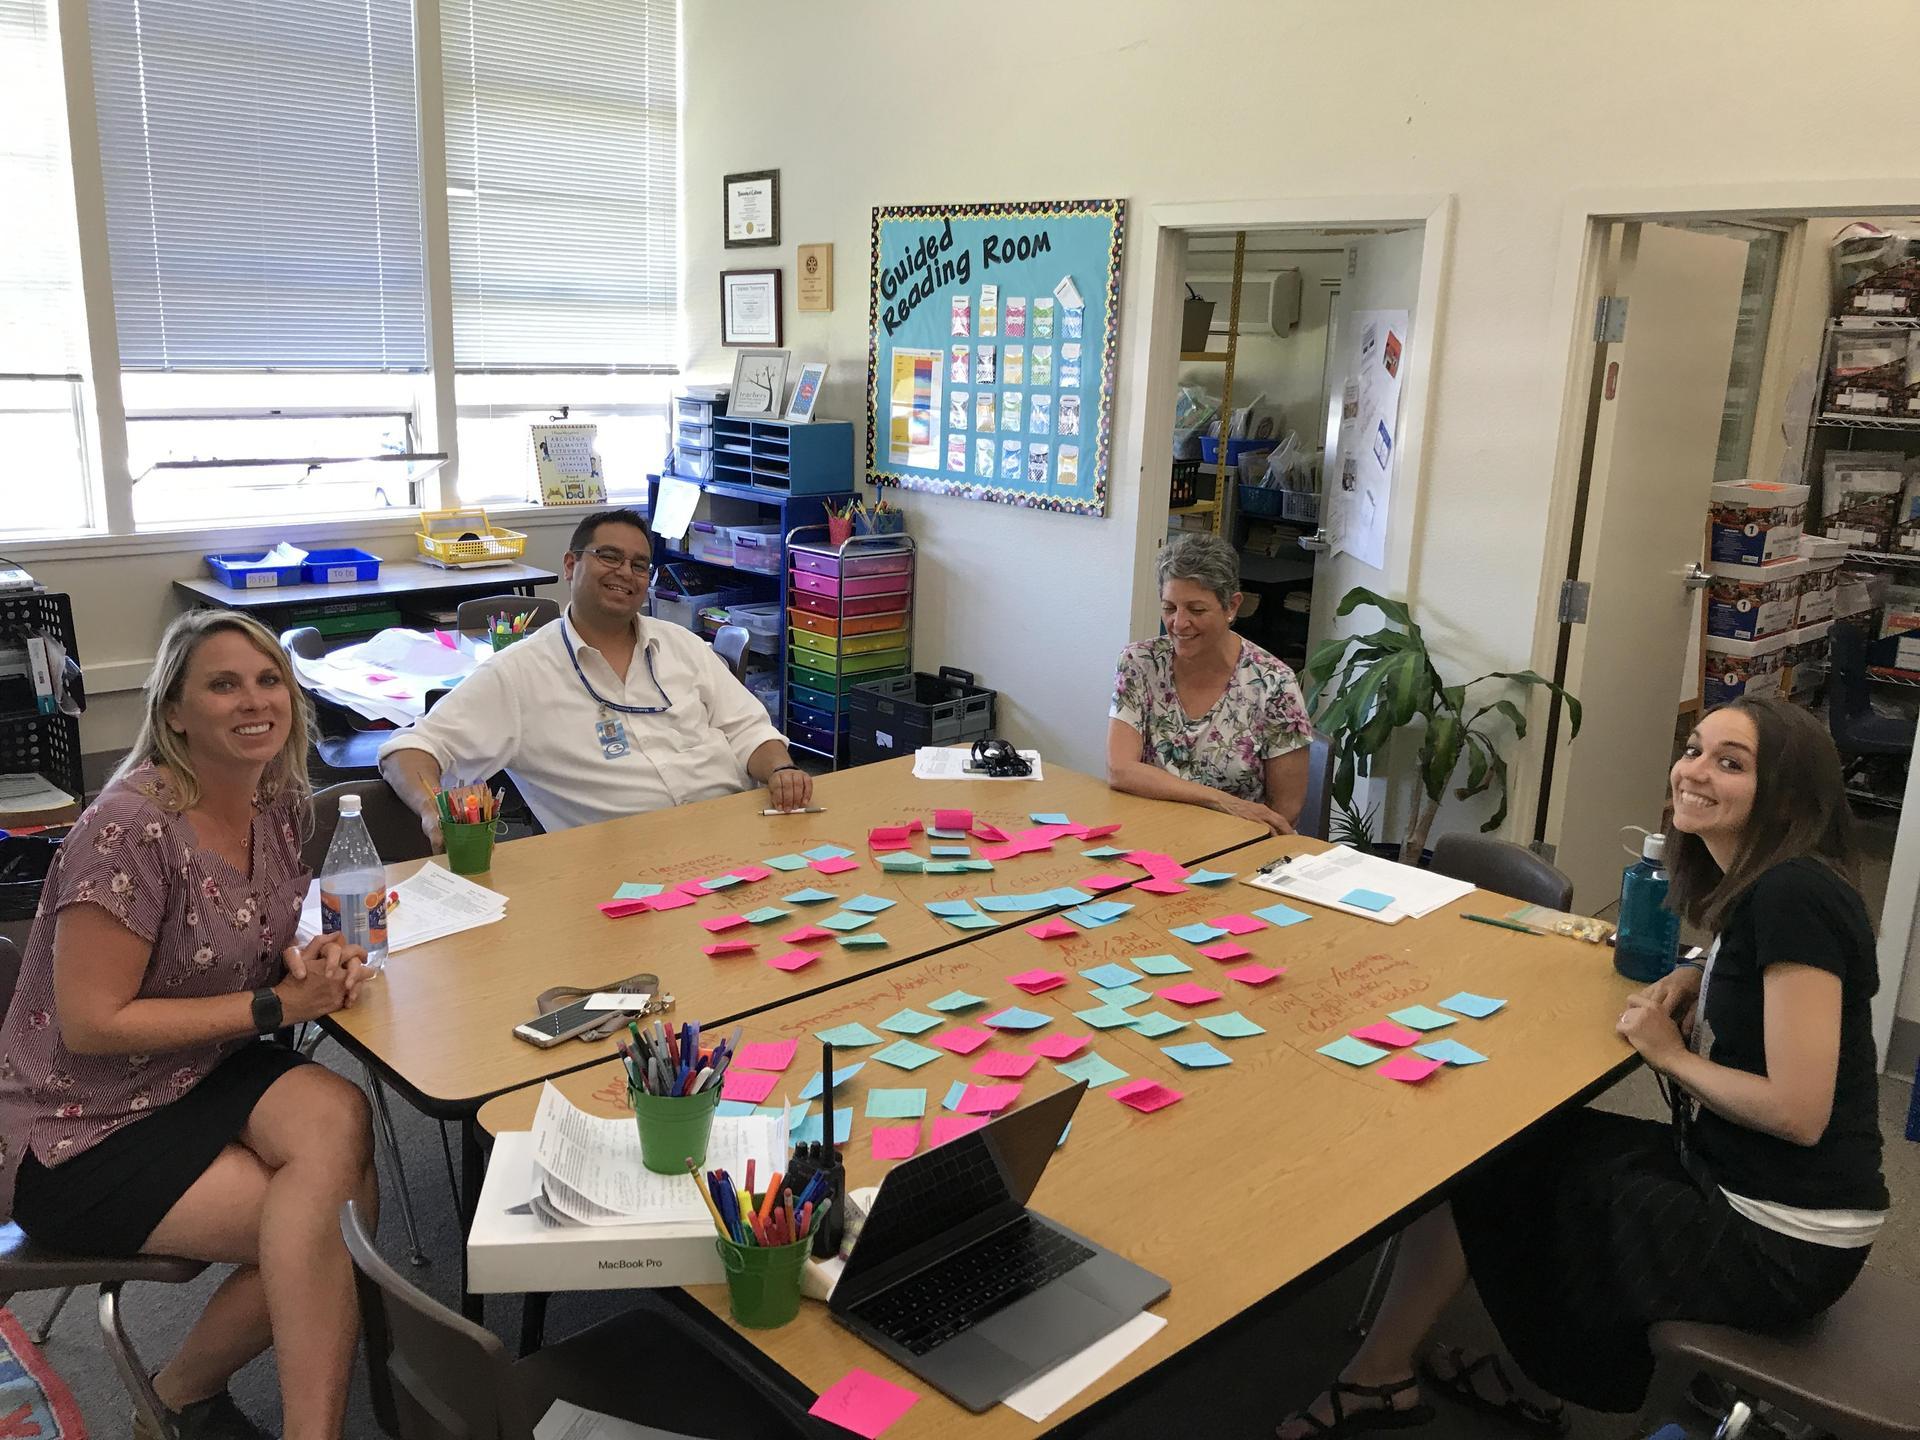 instructional leadership team members